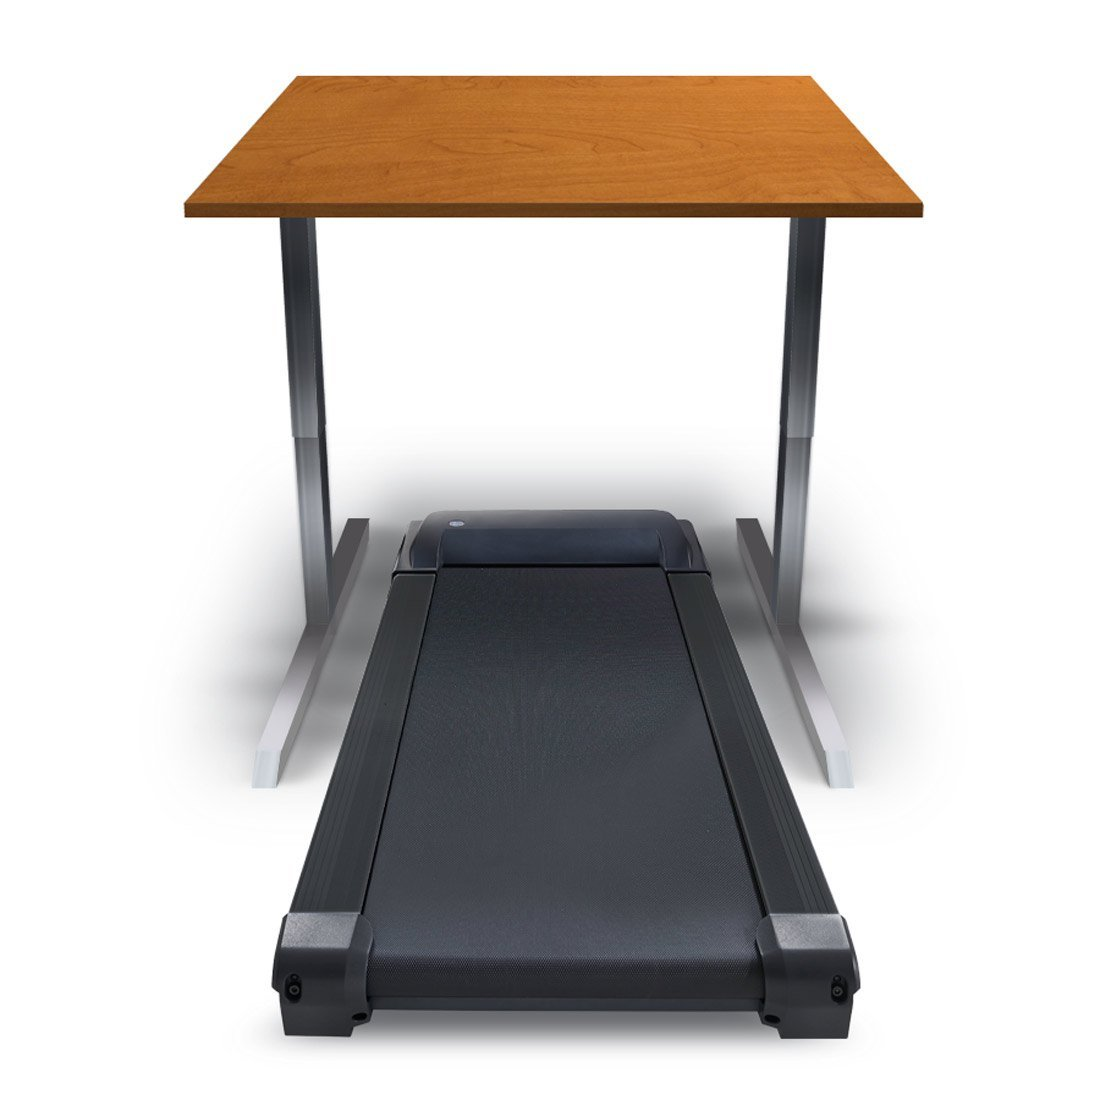 LifeSpan TR1200-DT3 Under Desk Treadmill (Amazon images)